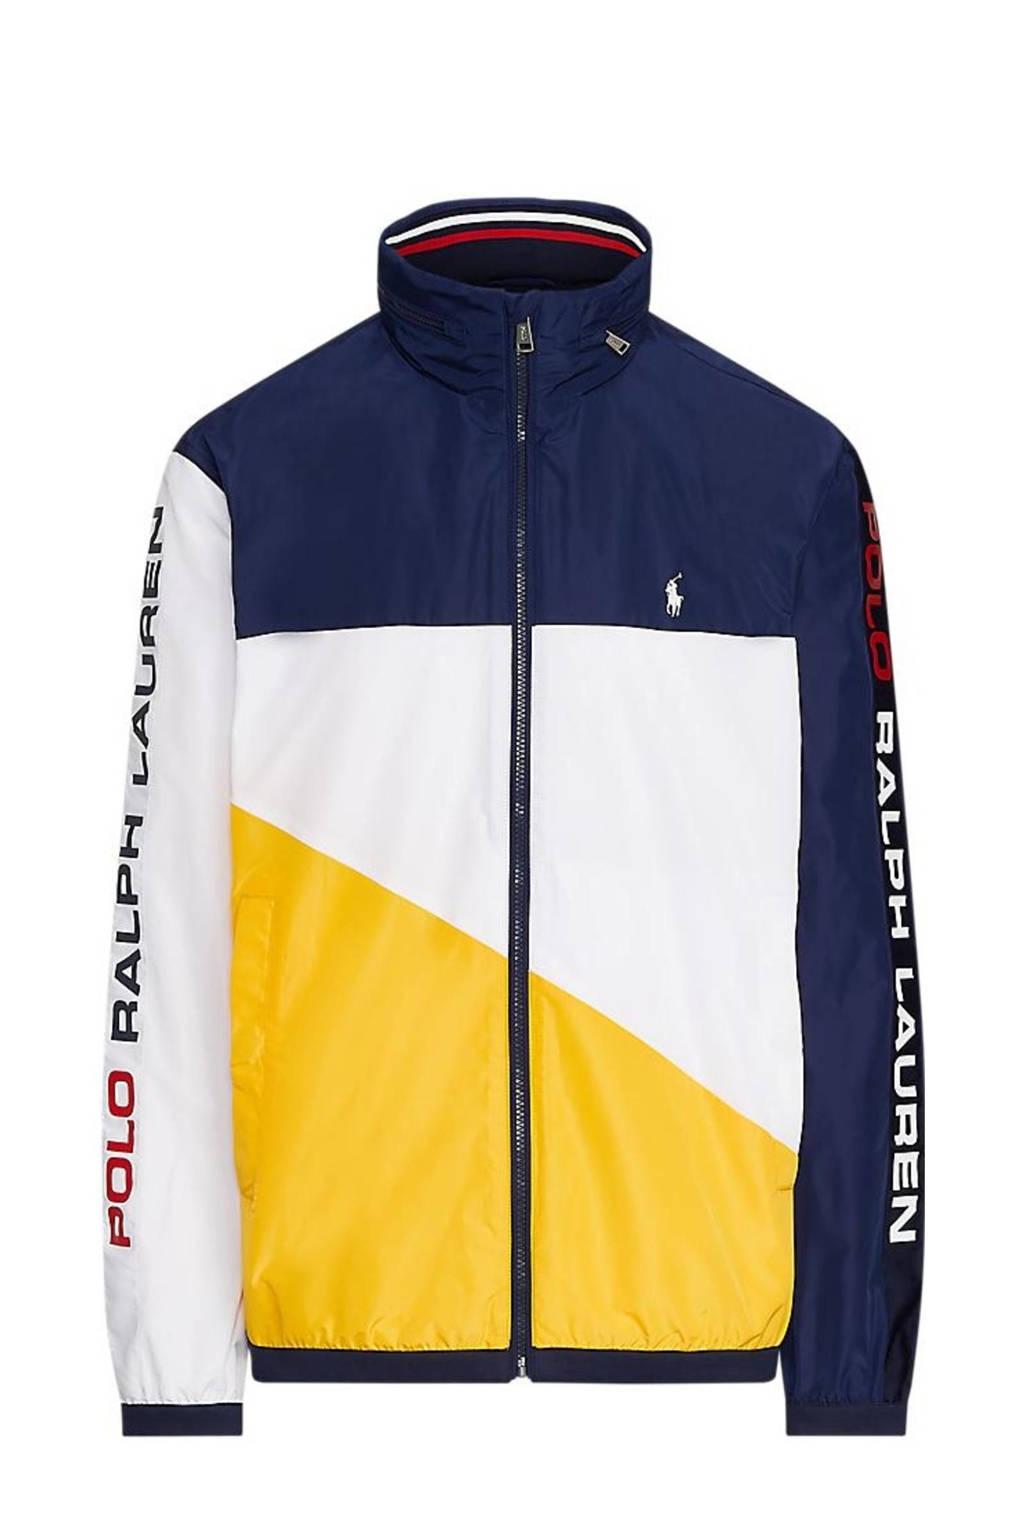 POLO Ralph Lauren Big & Tall +size zomerjas donkerblauw/wit/geel/rood, Donkerblauw/wit/geel/rood